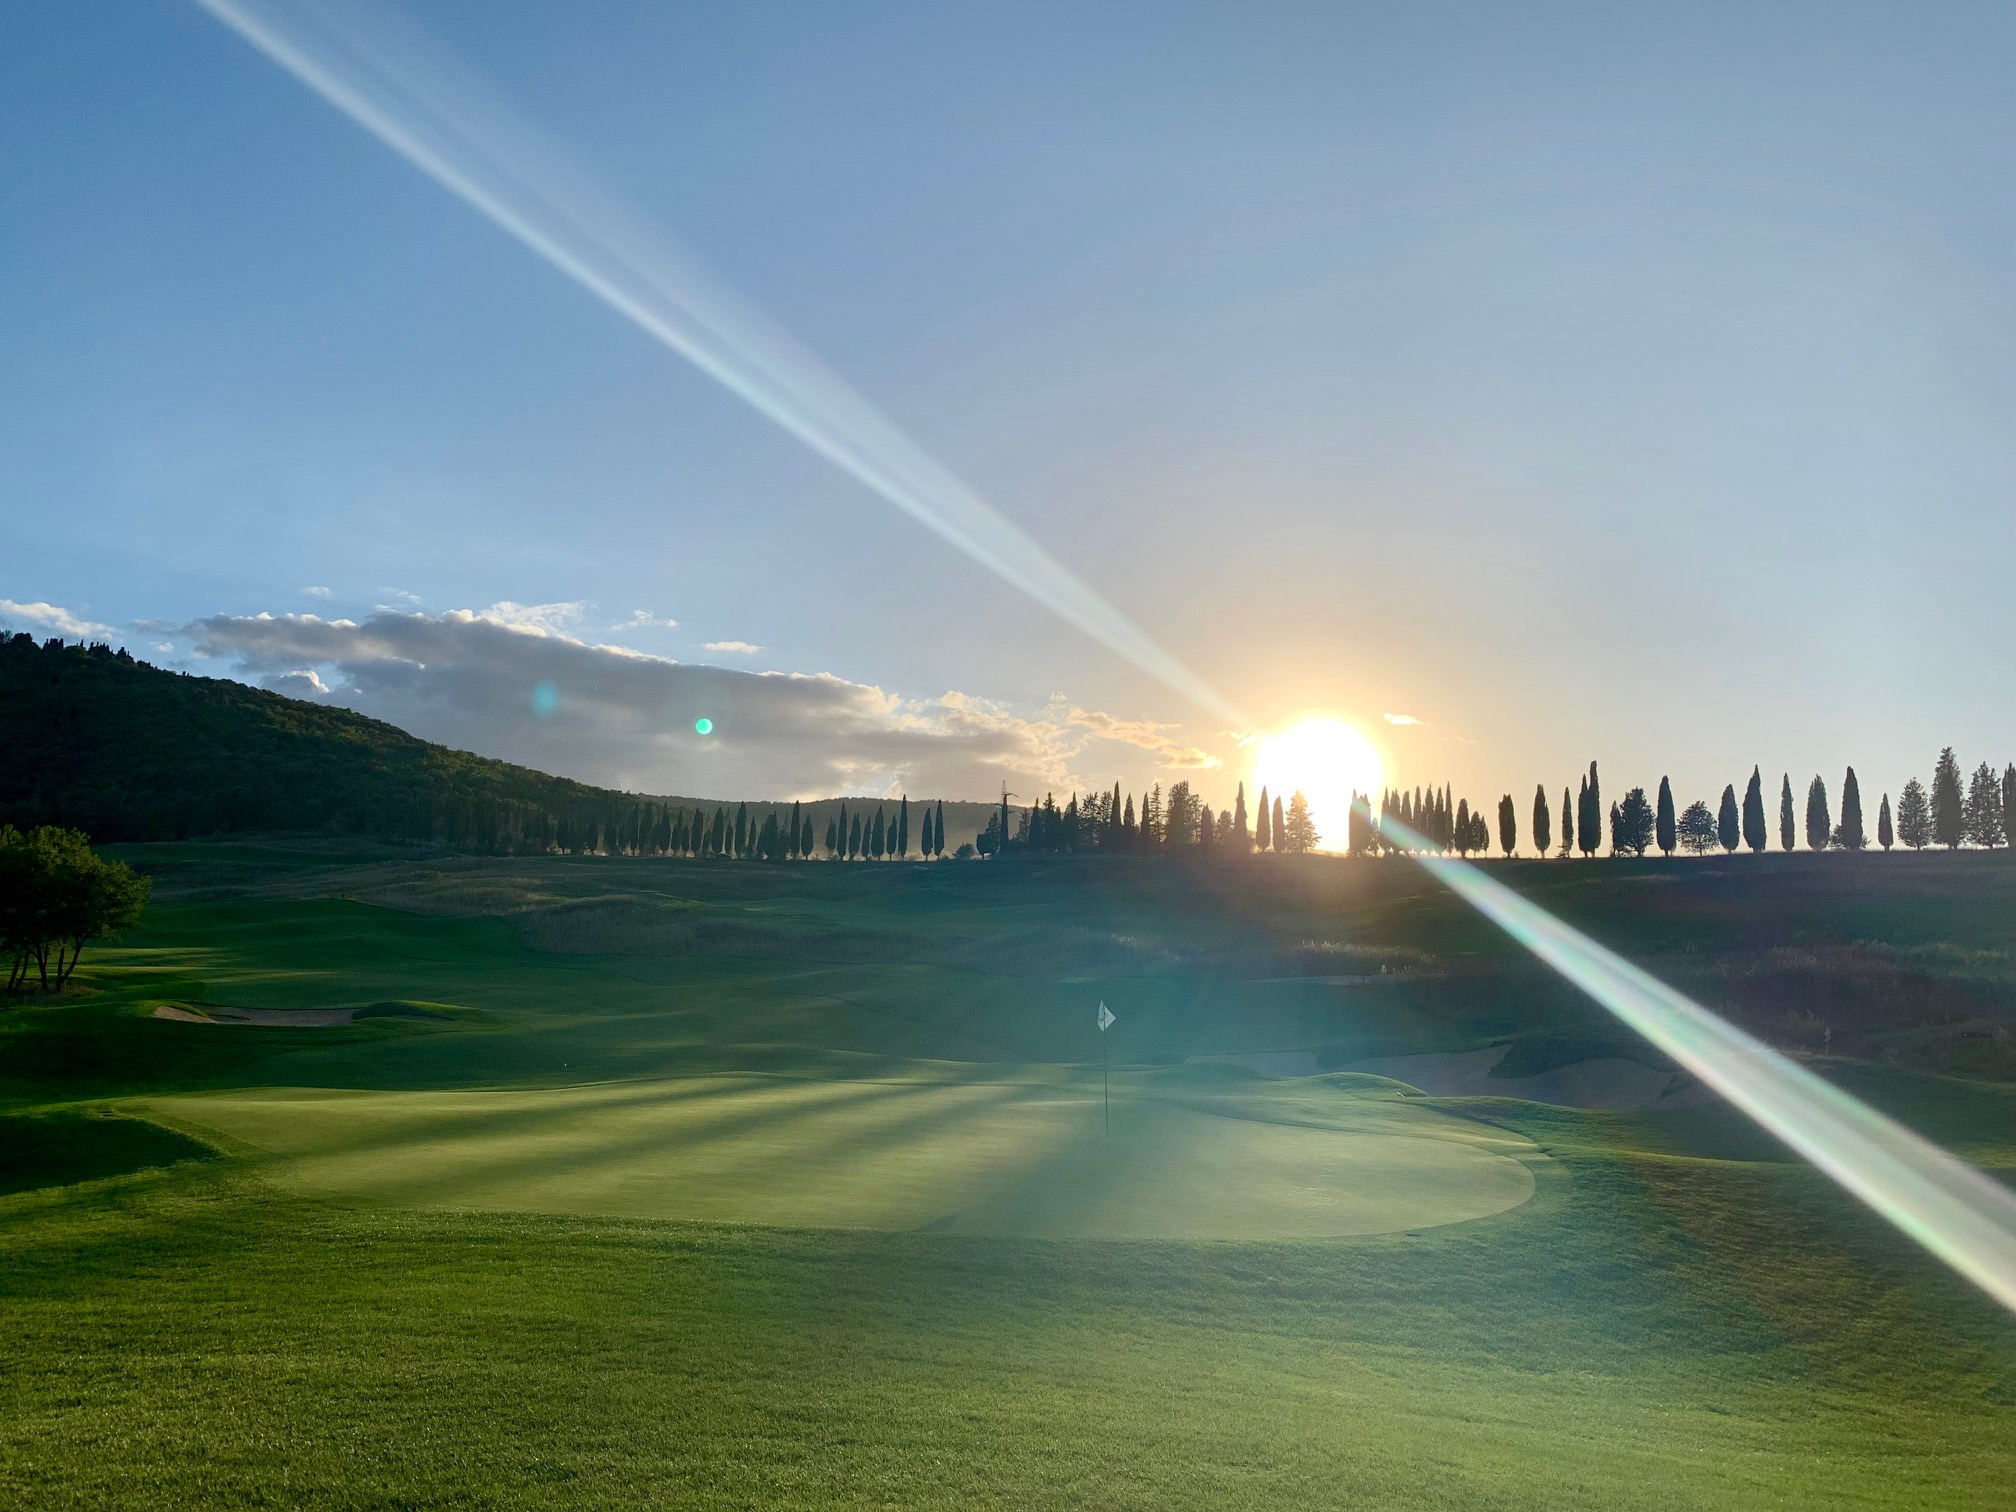 Golfbaan met boompjes